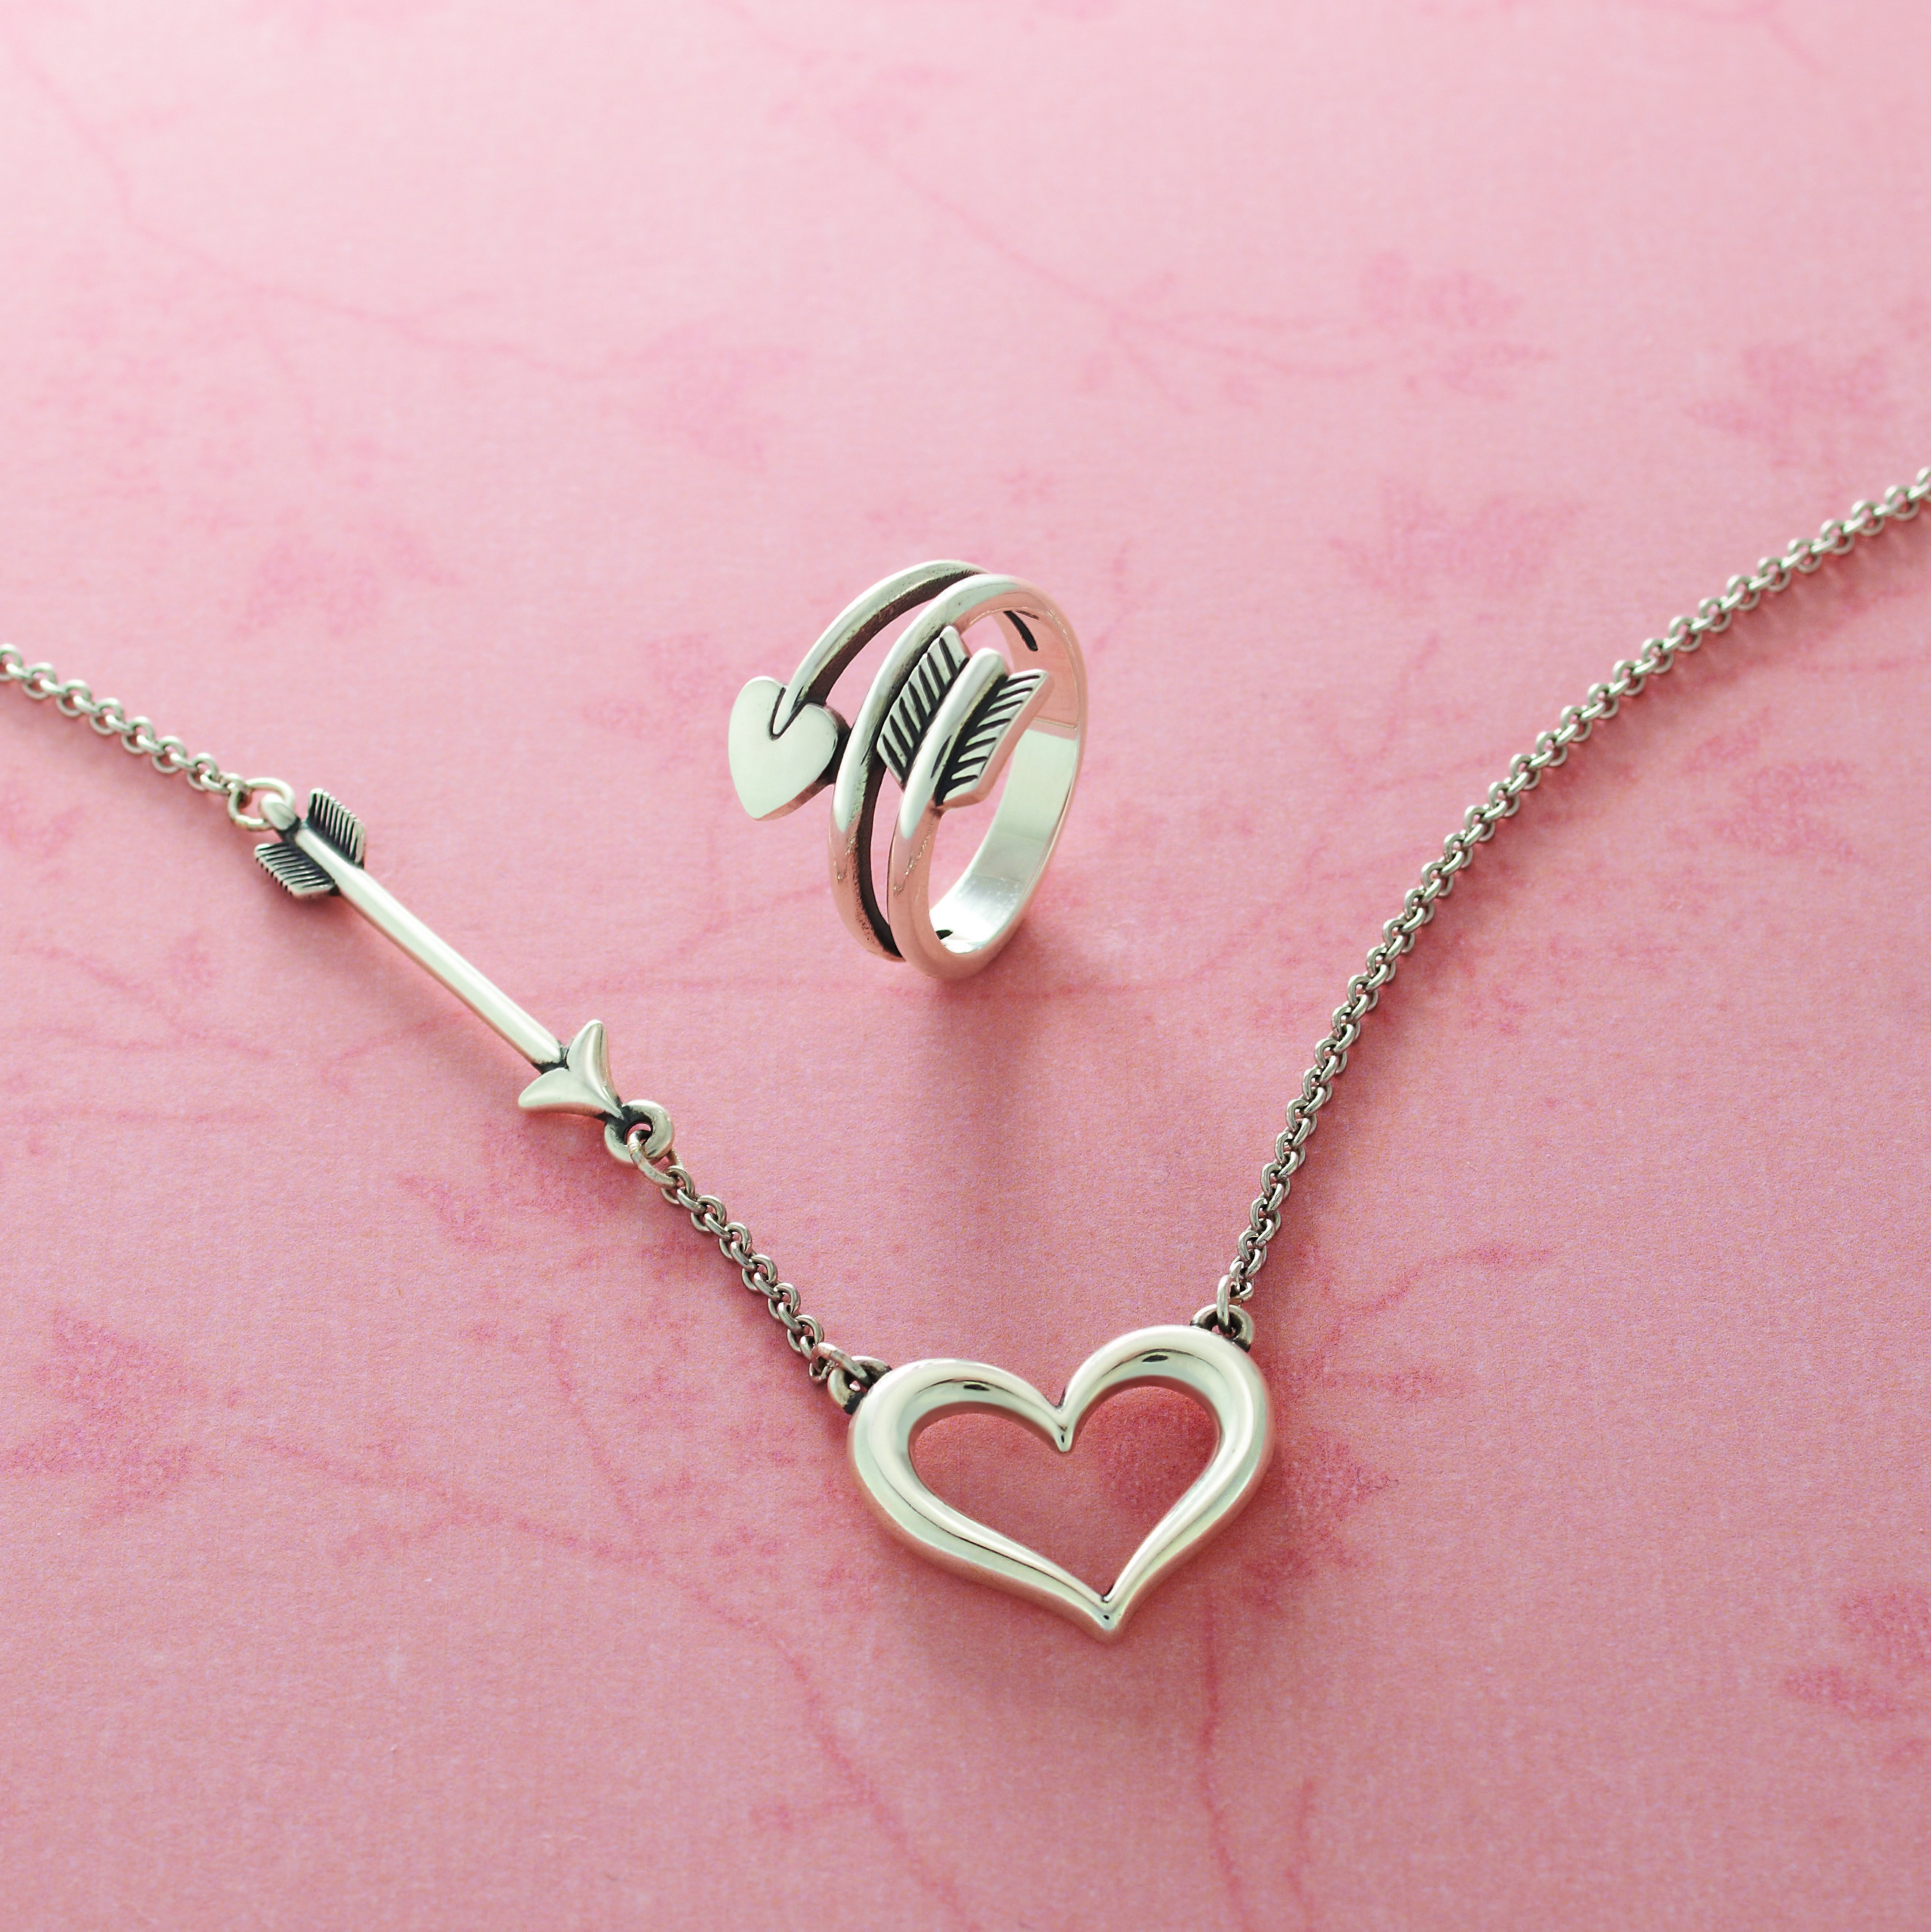 Pandora bracelet dillards - James Avery Jewelry Dillards